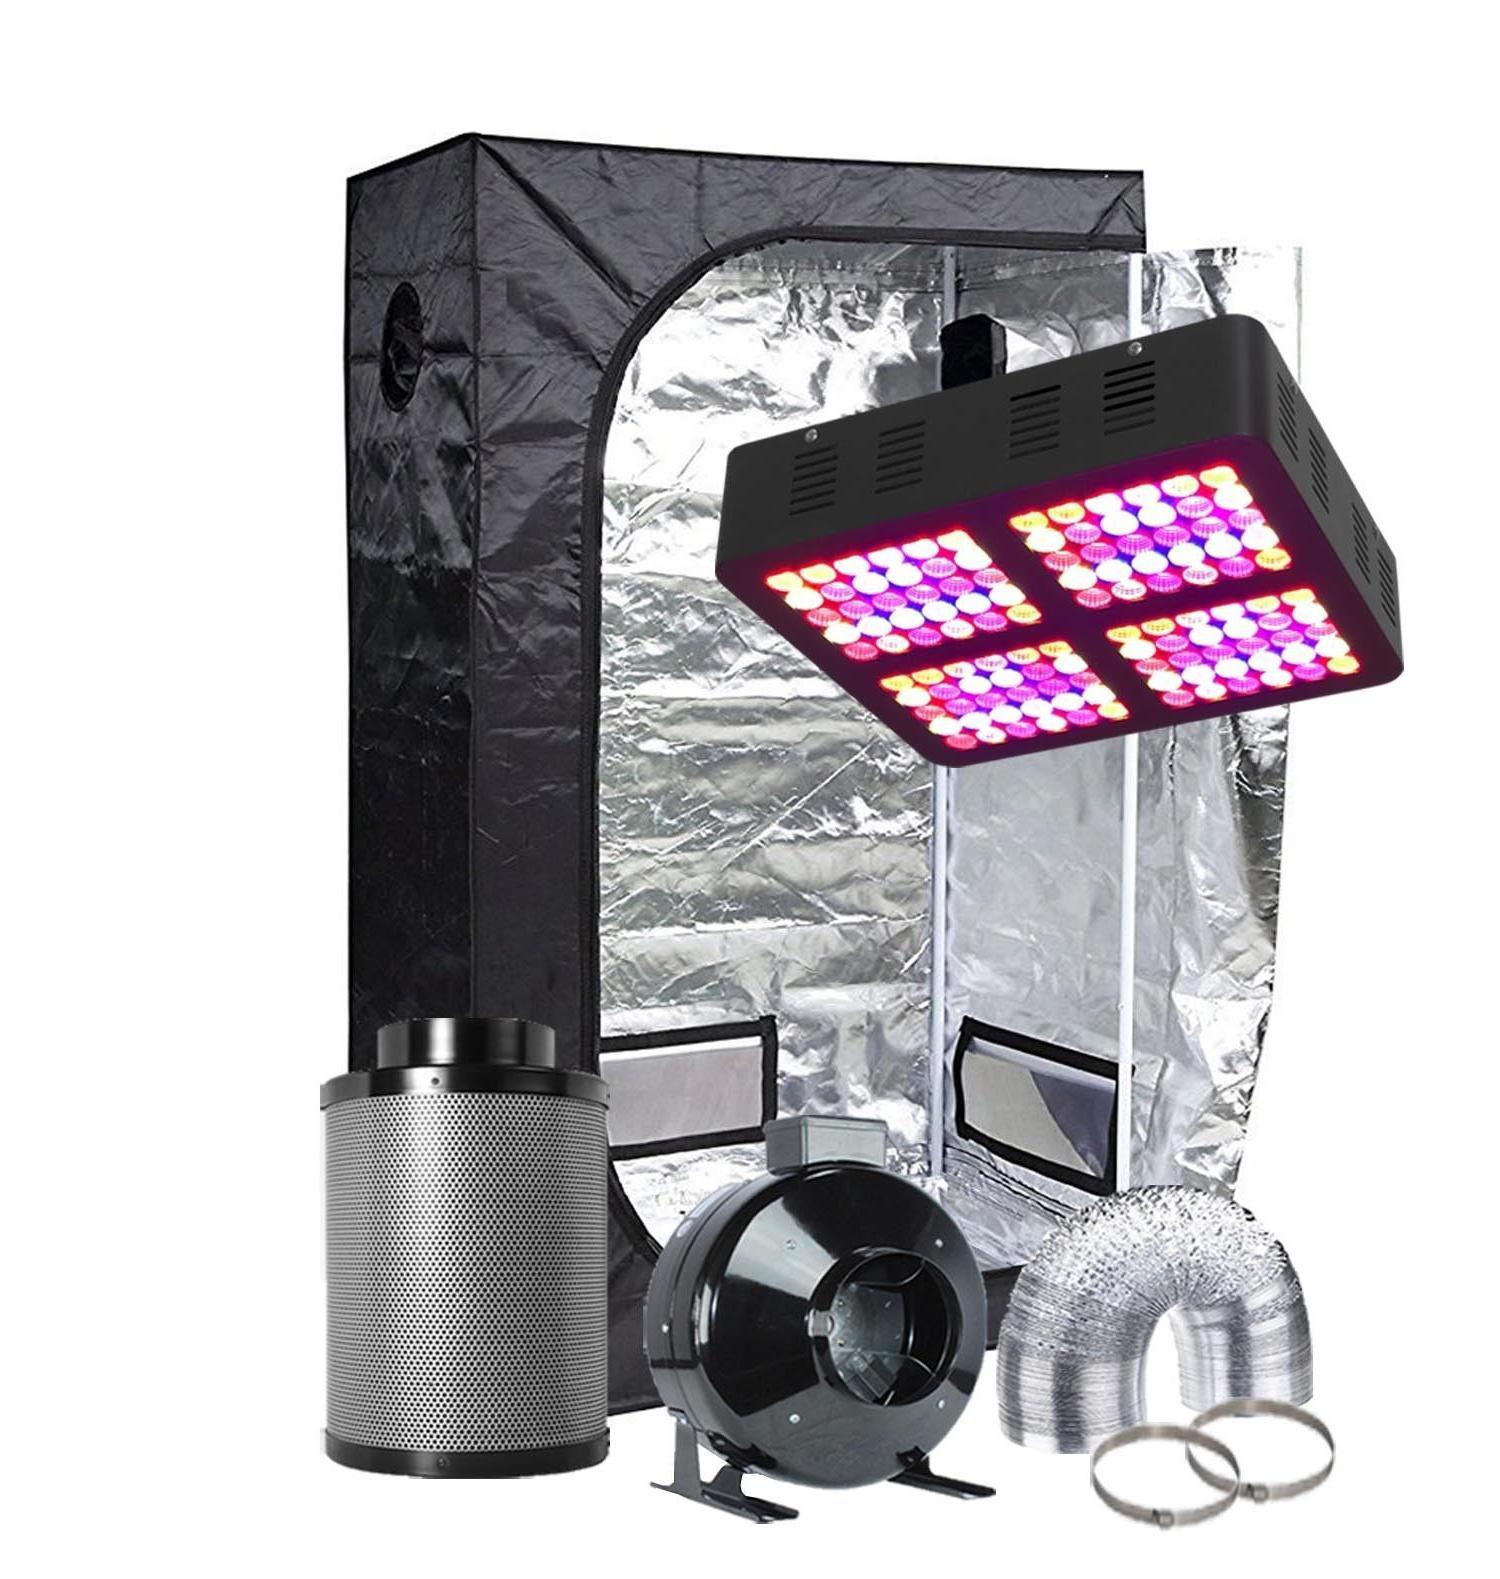 TopoGrow 600W Grow Light Kit + Indoor Grow Tent Room Kit